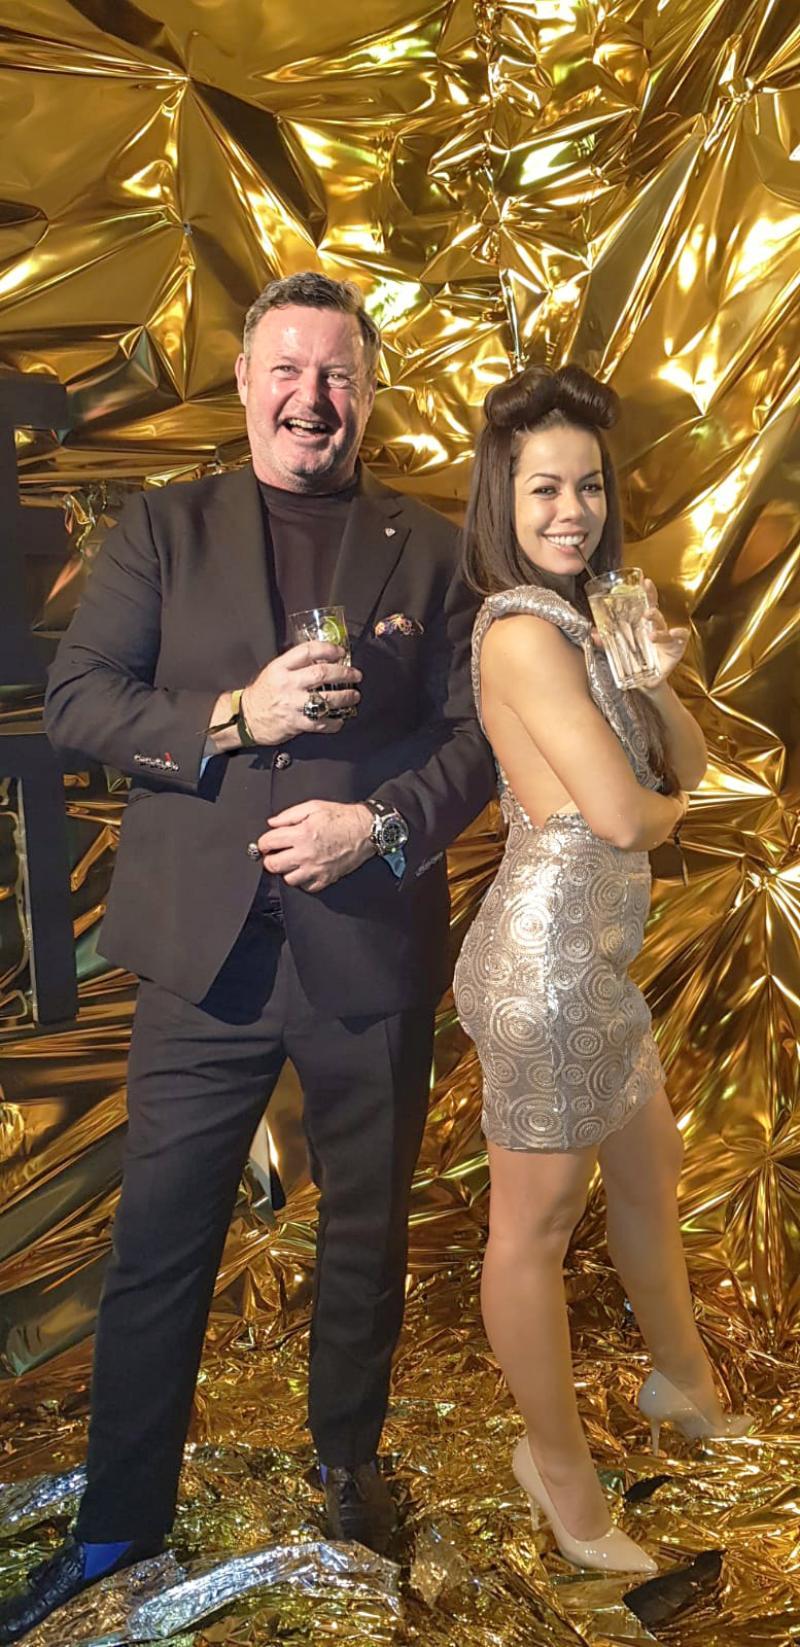 Christian Jäger & Fernanda Brandão